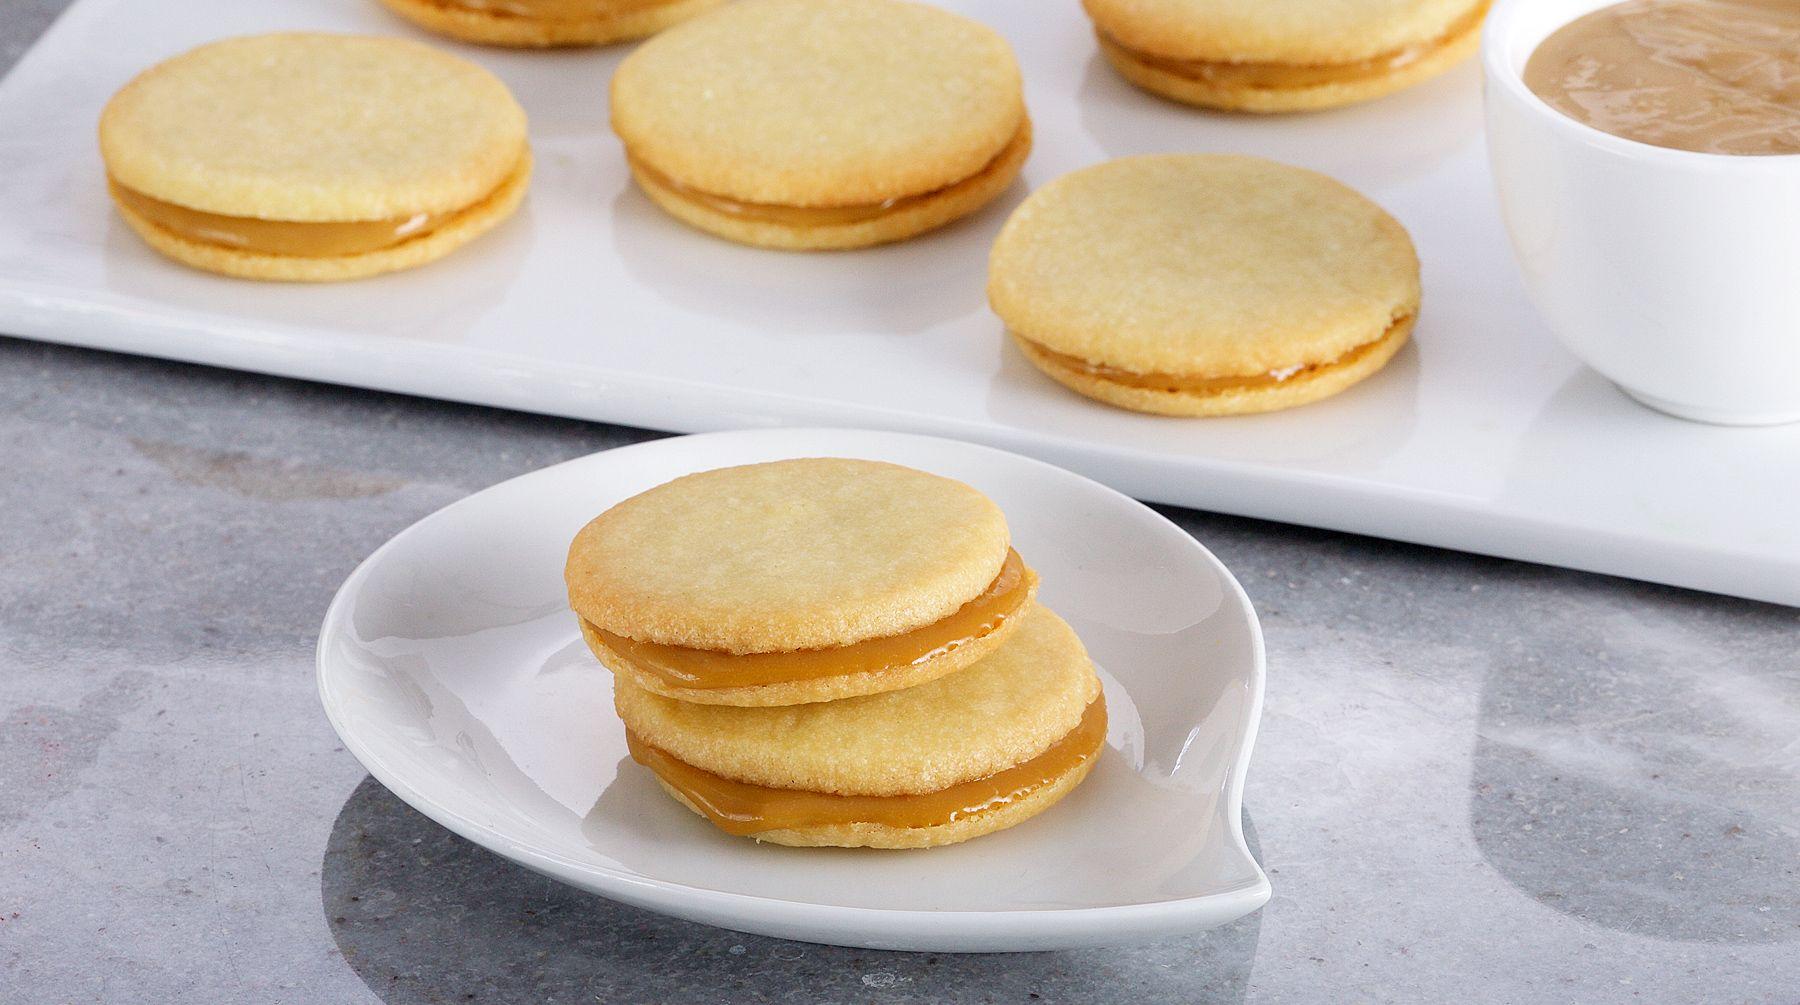 Bake with anna olson recipes coconut caramel sandwich cookies bake with anna olson recipes coconut caramel sandwich cookies asian food channel forumfinder Gallery